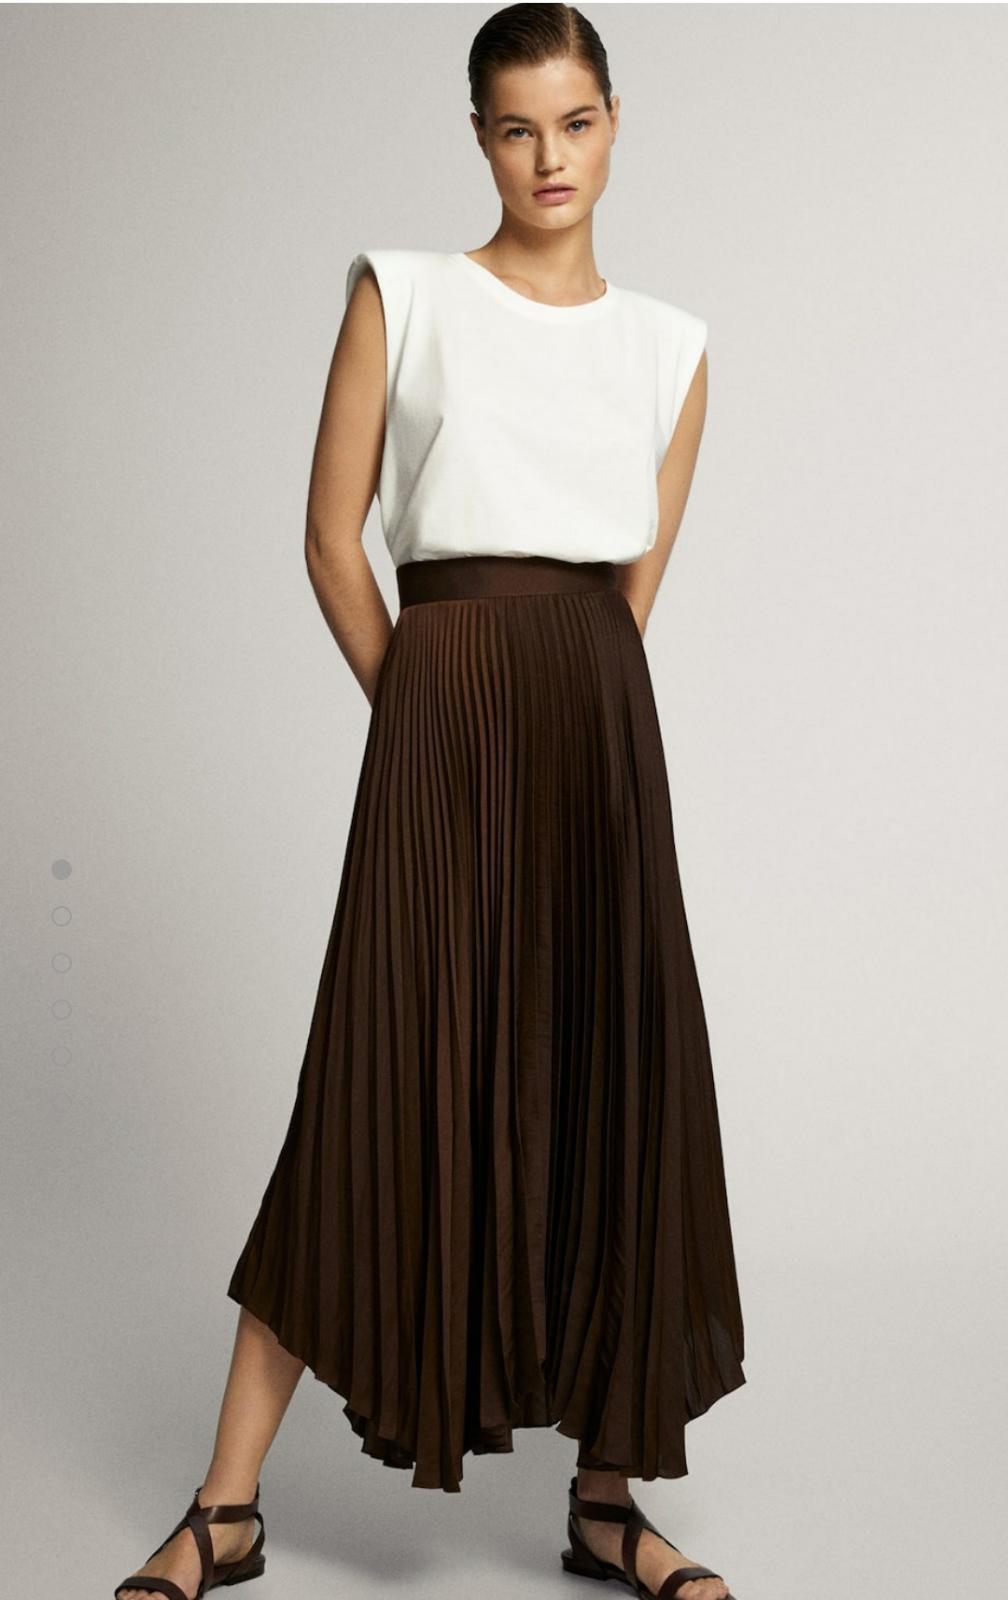 Falda plisada color marrón de Massimo Dutti 39'95€